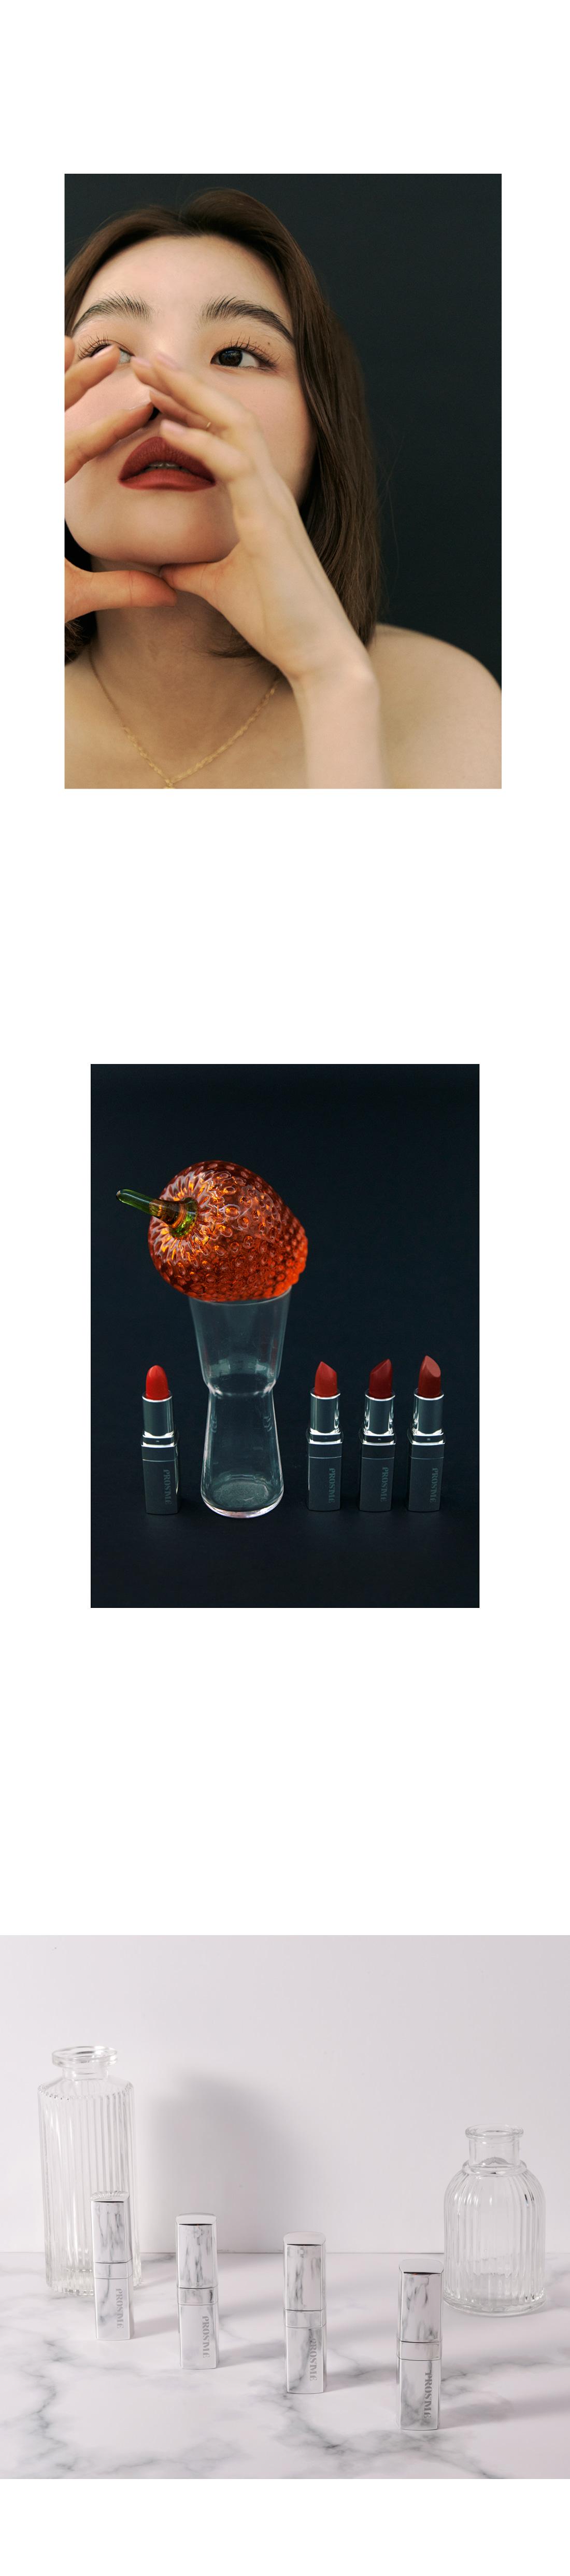 sale) 004 Satin Fit Lipstick Brilliant Party